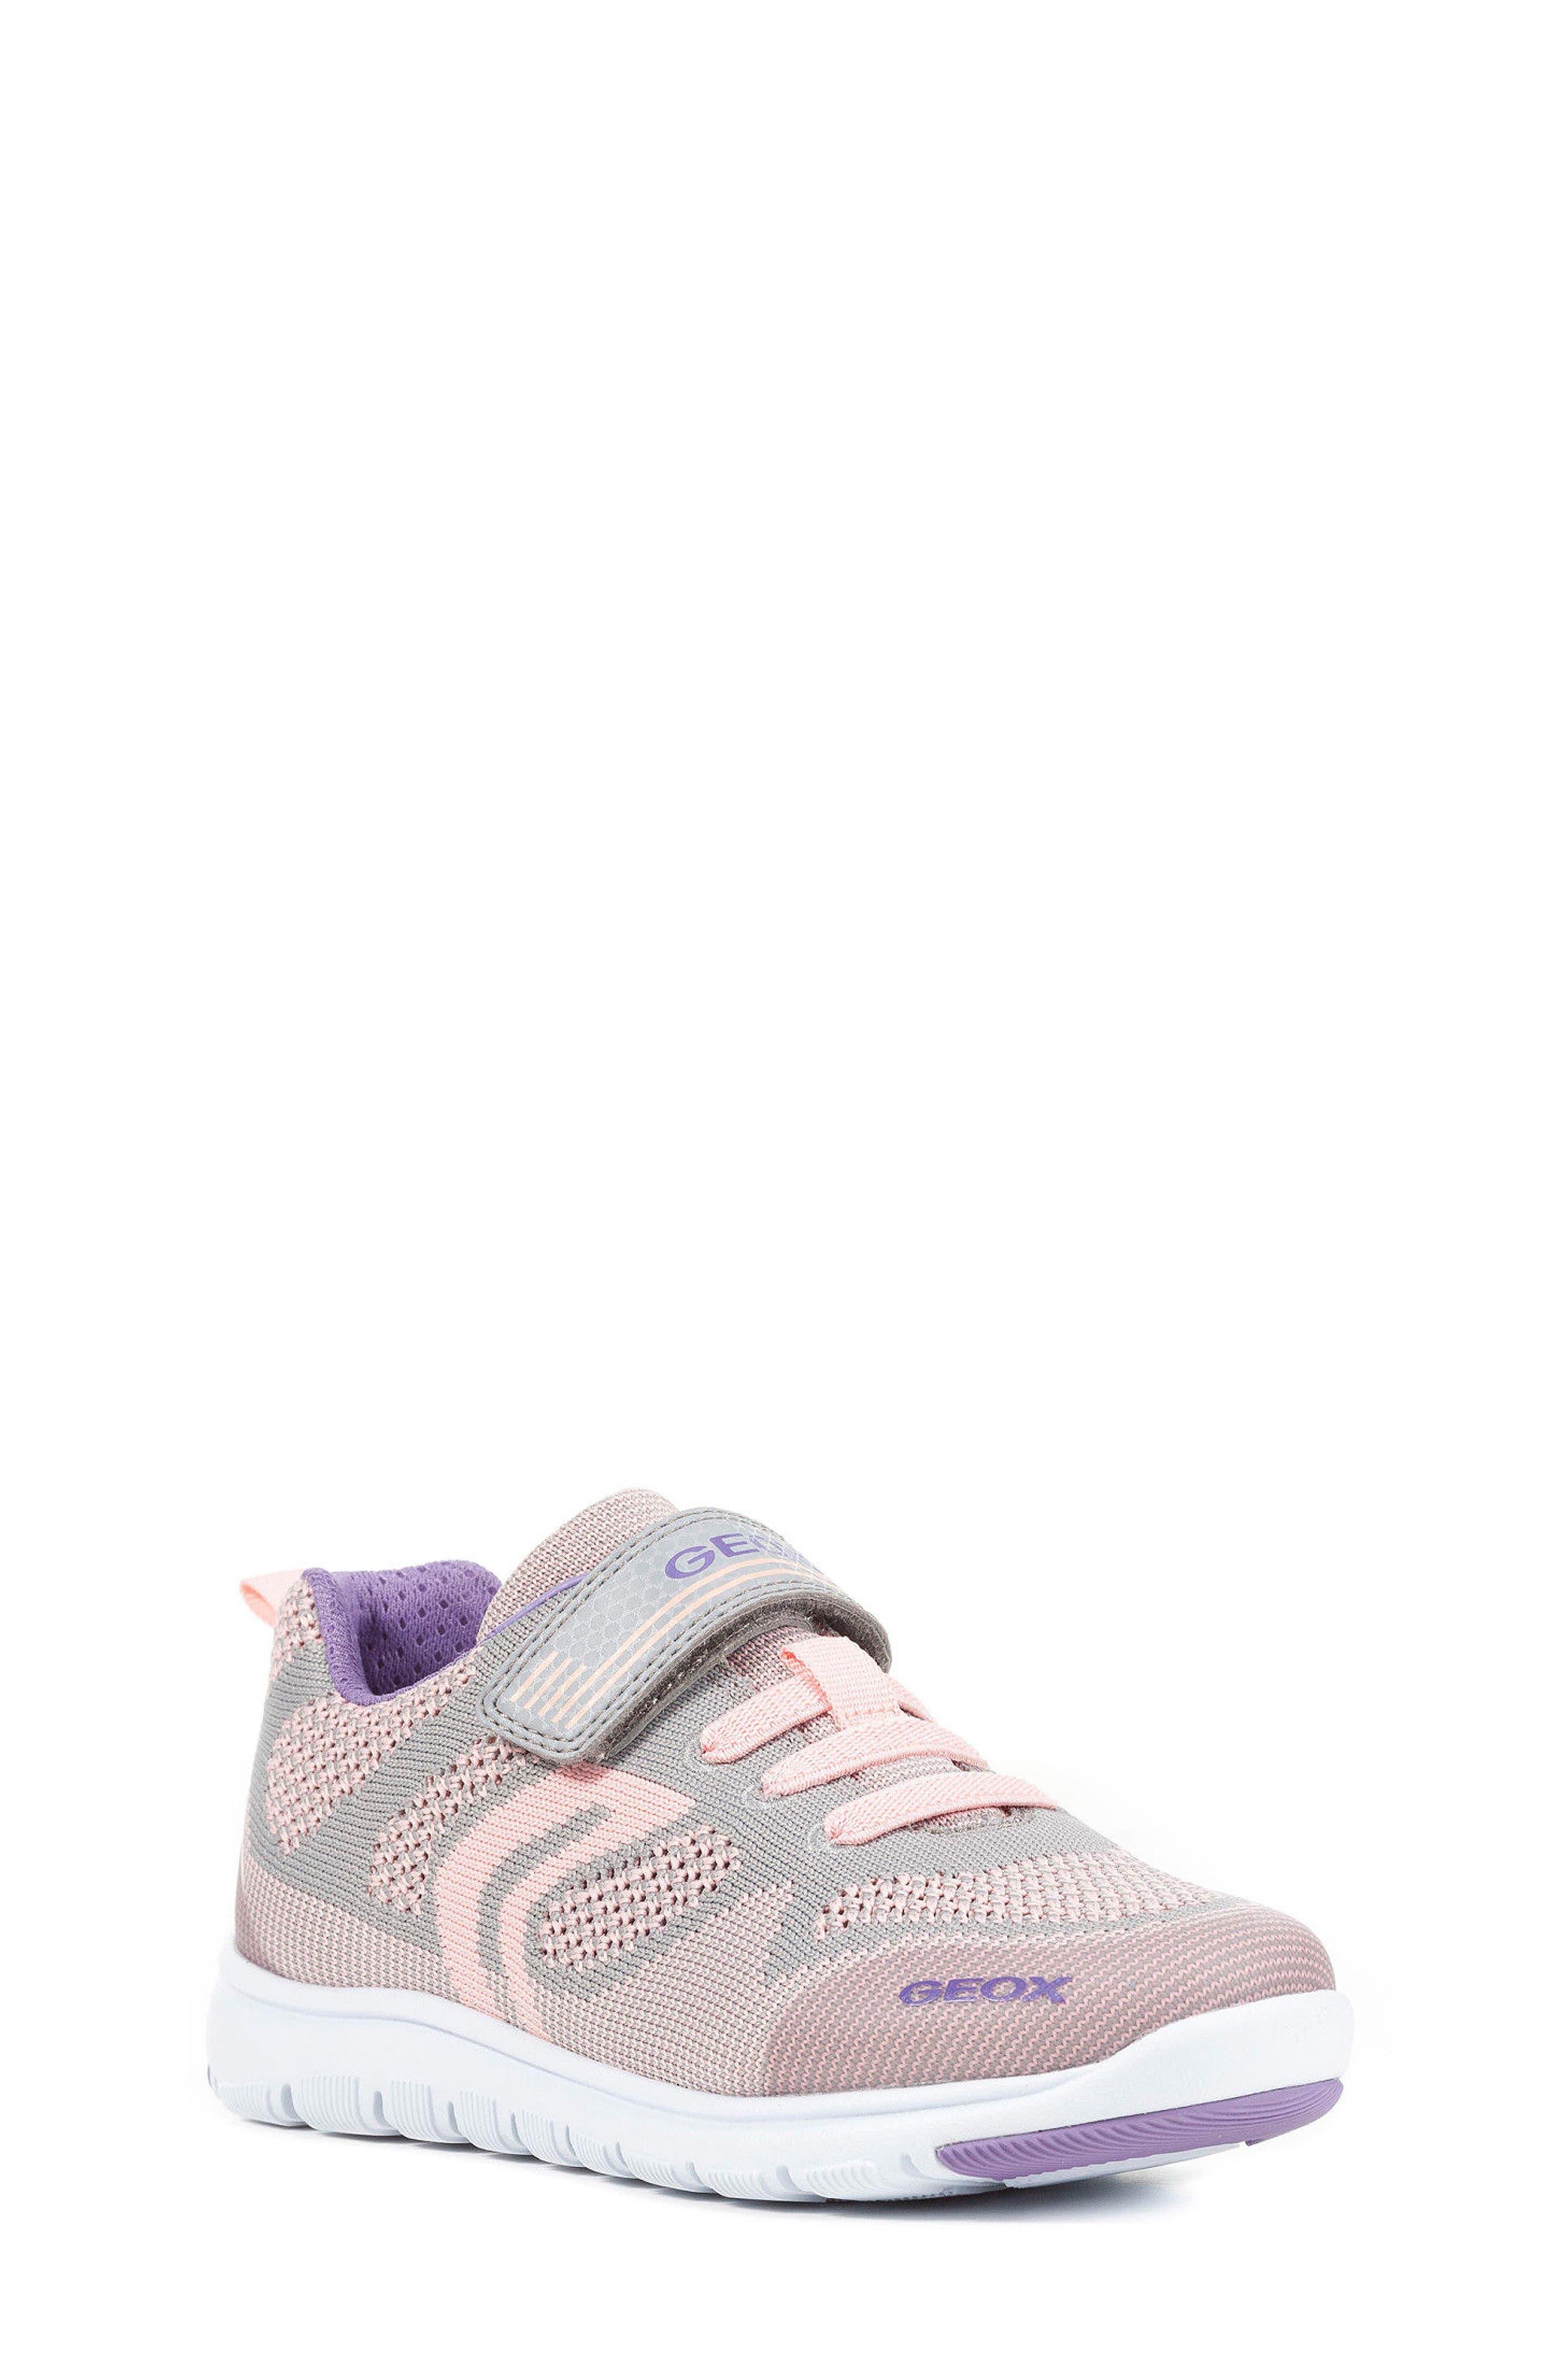 Main Image - Geox Xunday Low Top Woven Sneaker (Toddler, Little Kid & Big Kid)